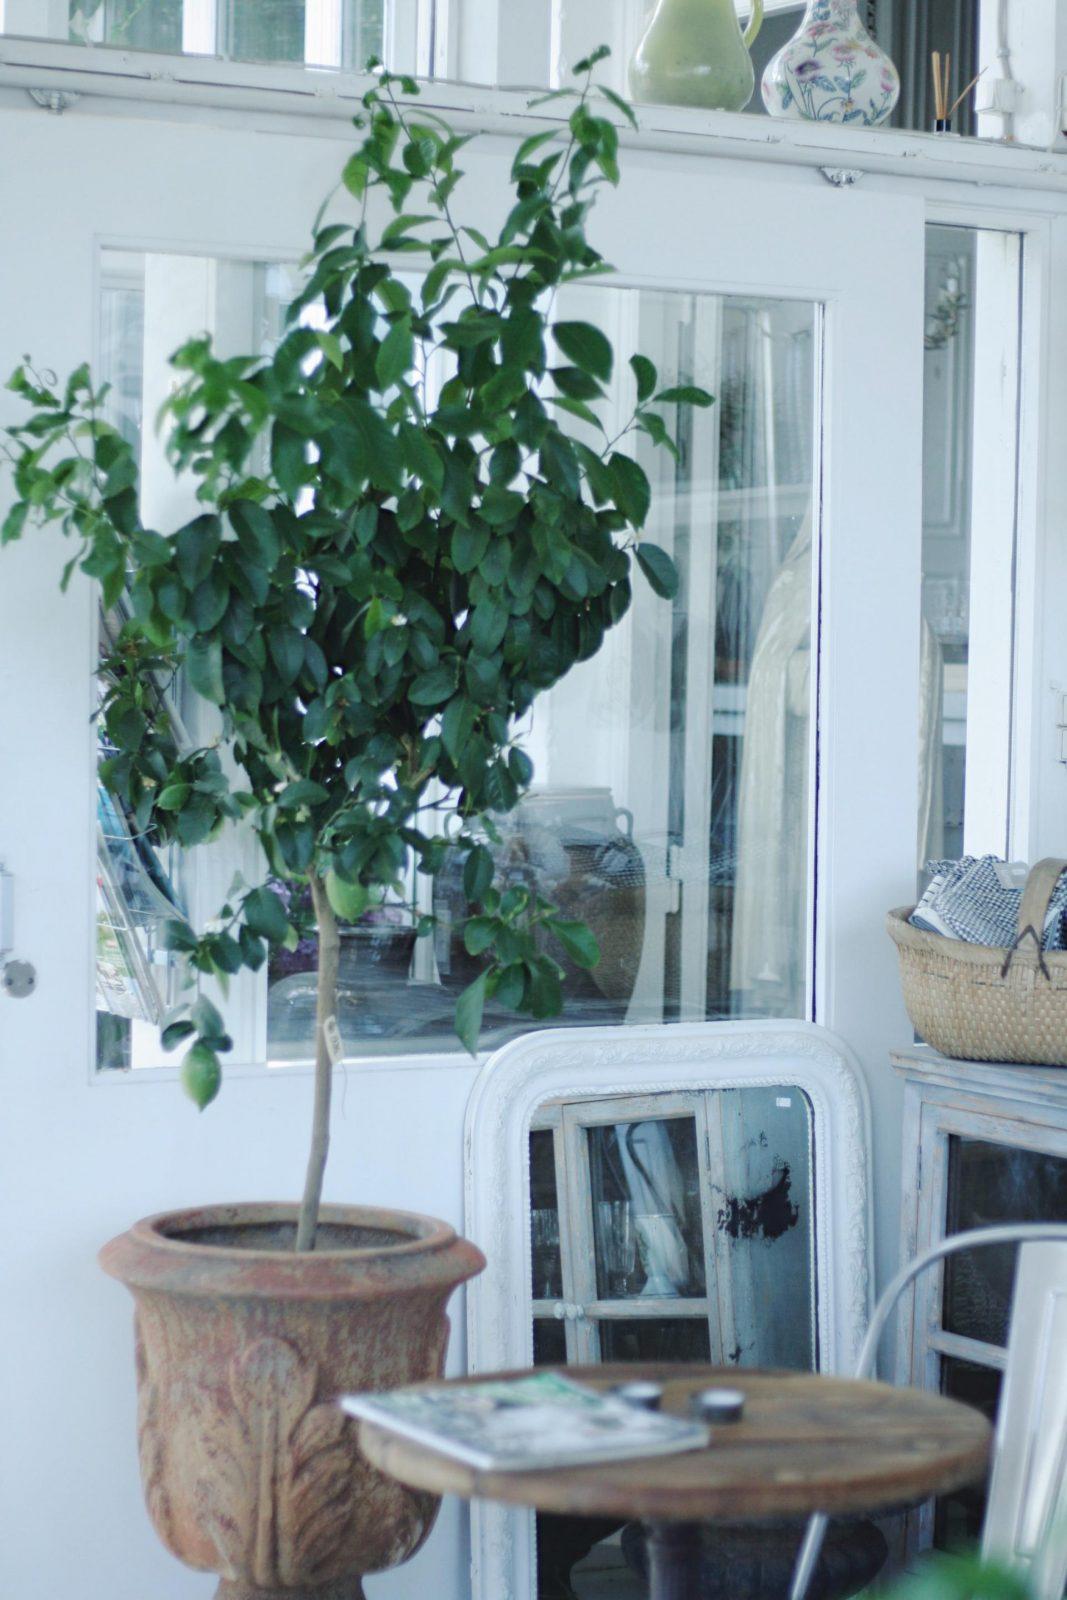 Interior-Idylle in Hornbæk: Bord & Bænk & jede Menge Tipps für Dänemark mit Kindern | Pinspiration